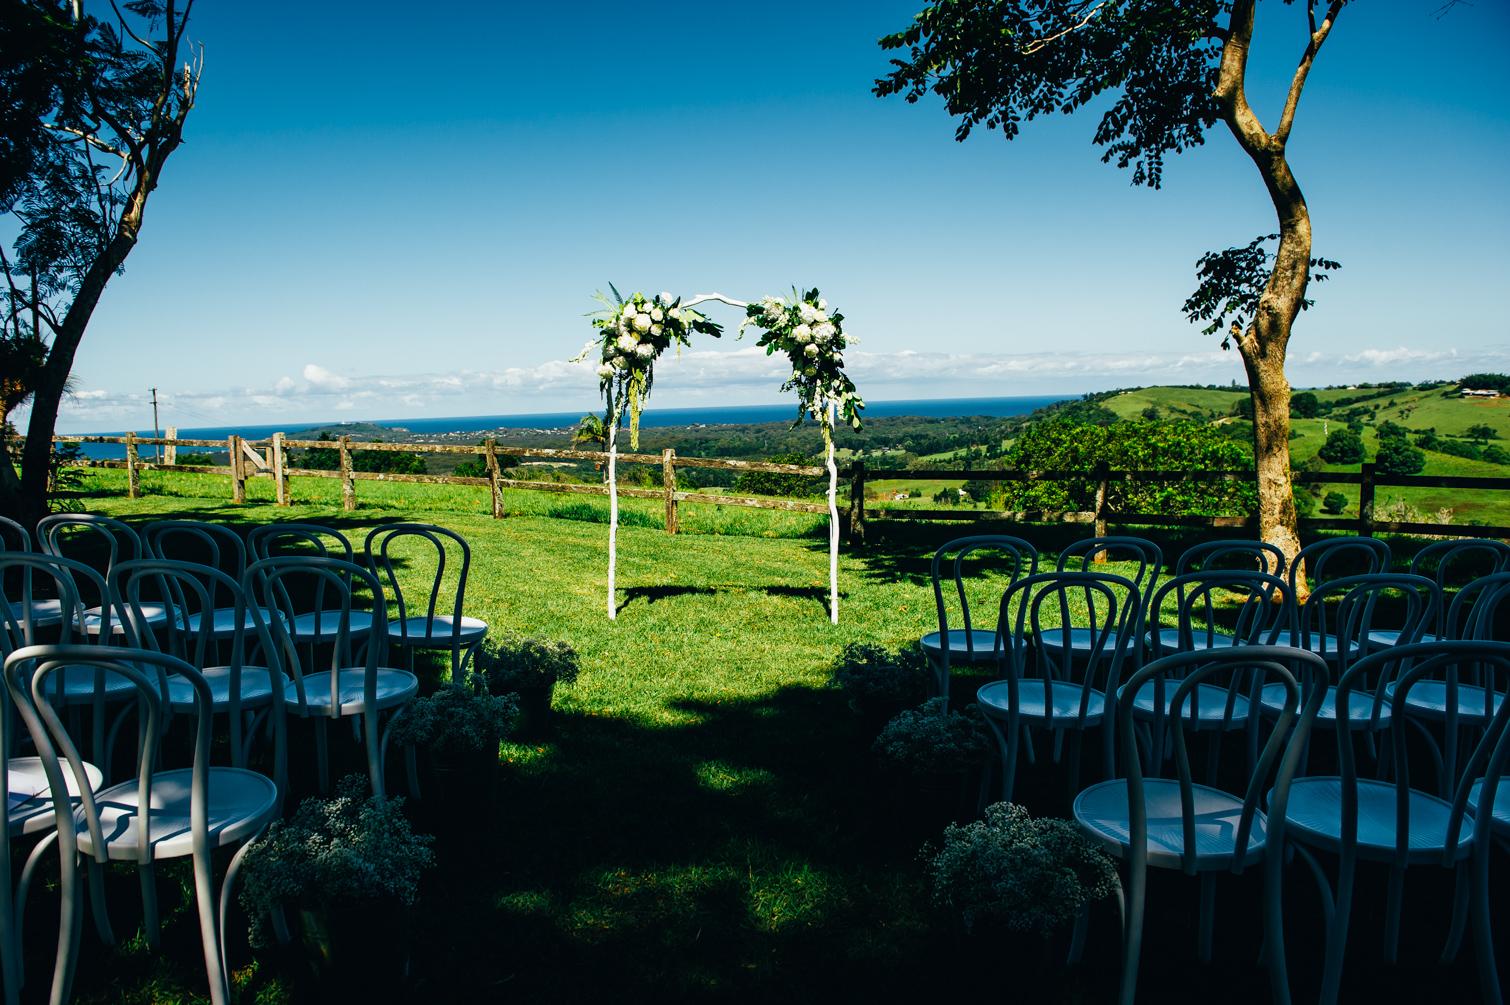 Byron_View_Wedding_Venue-6.jpg